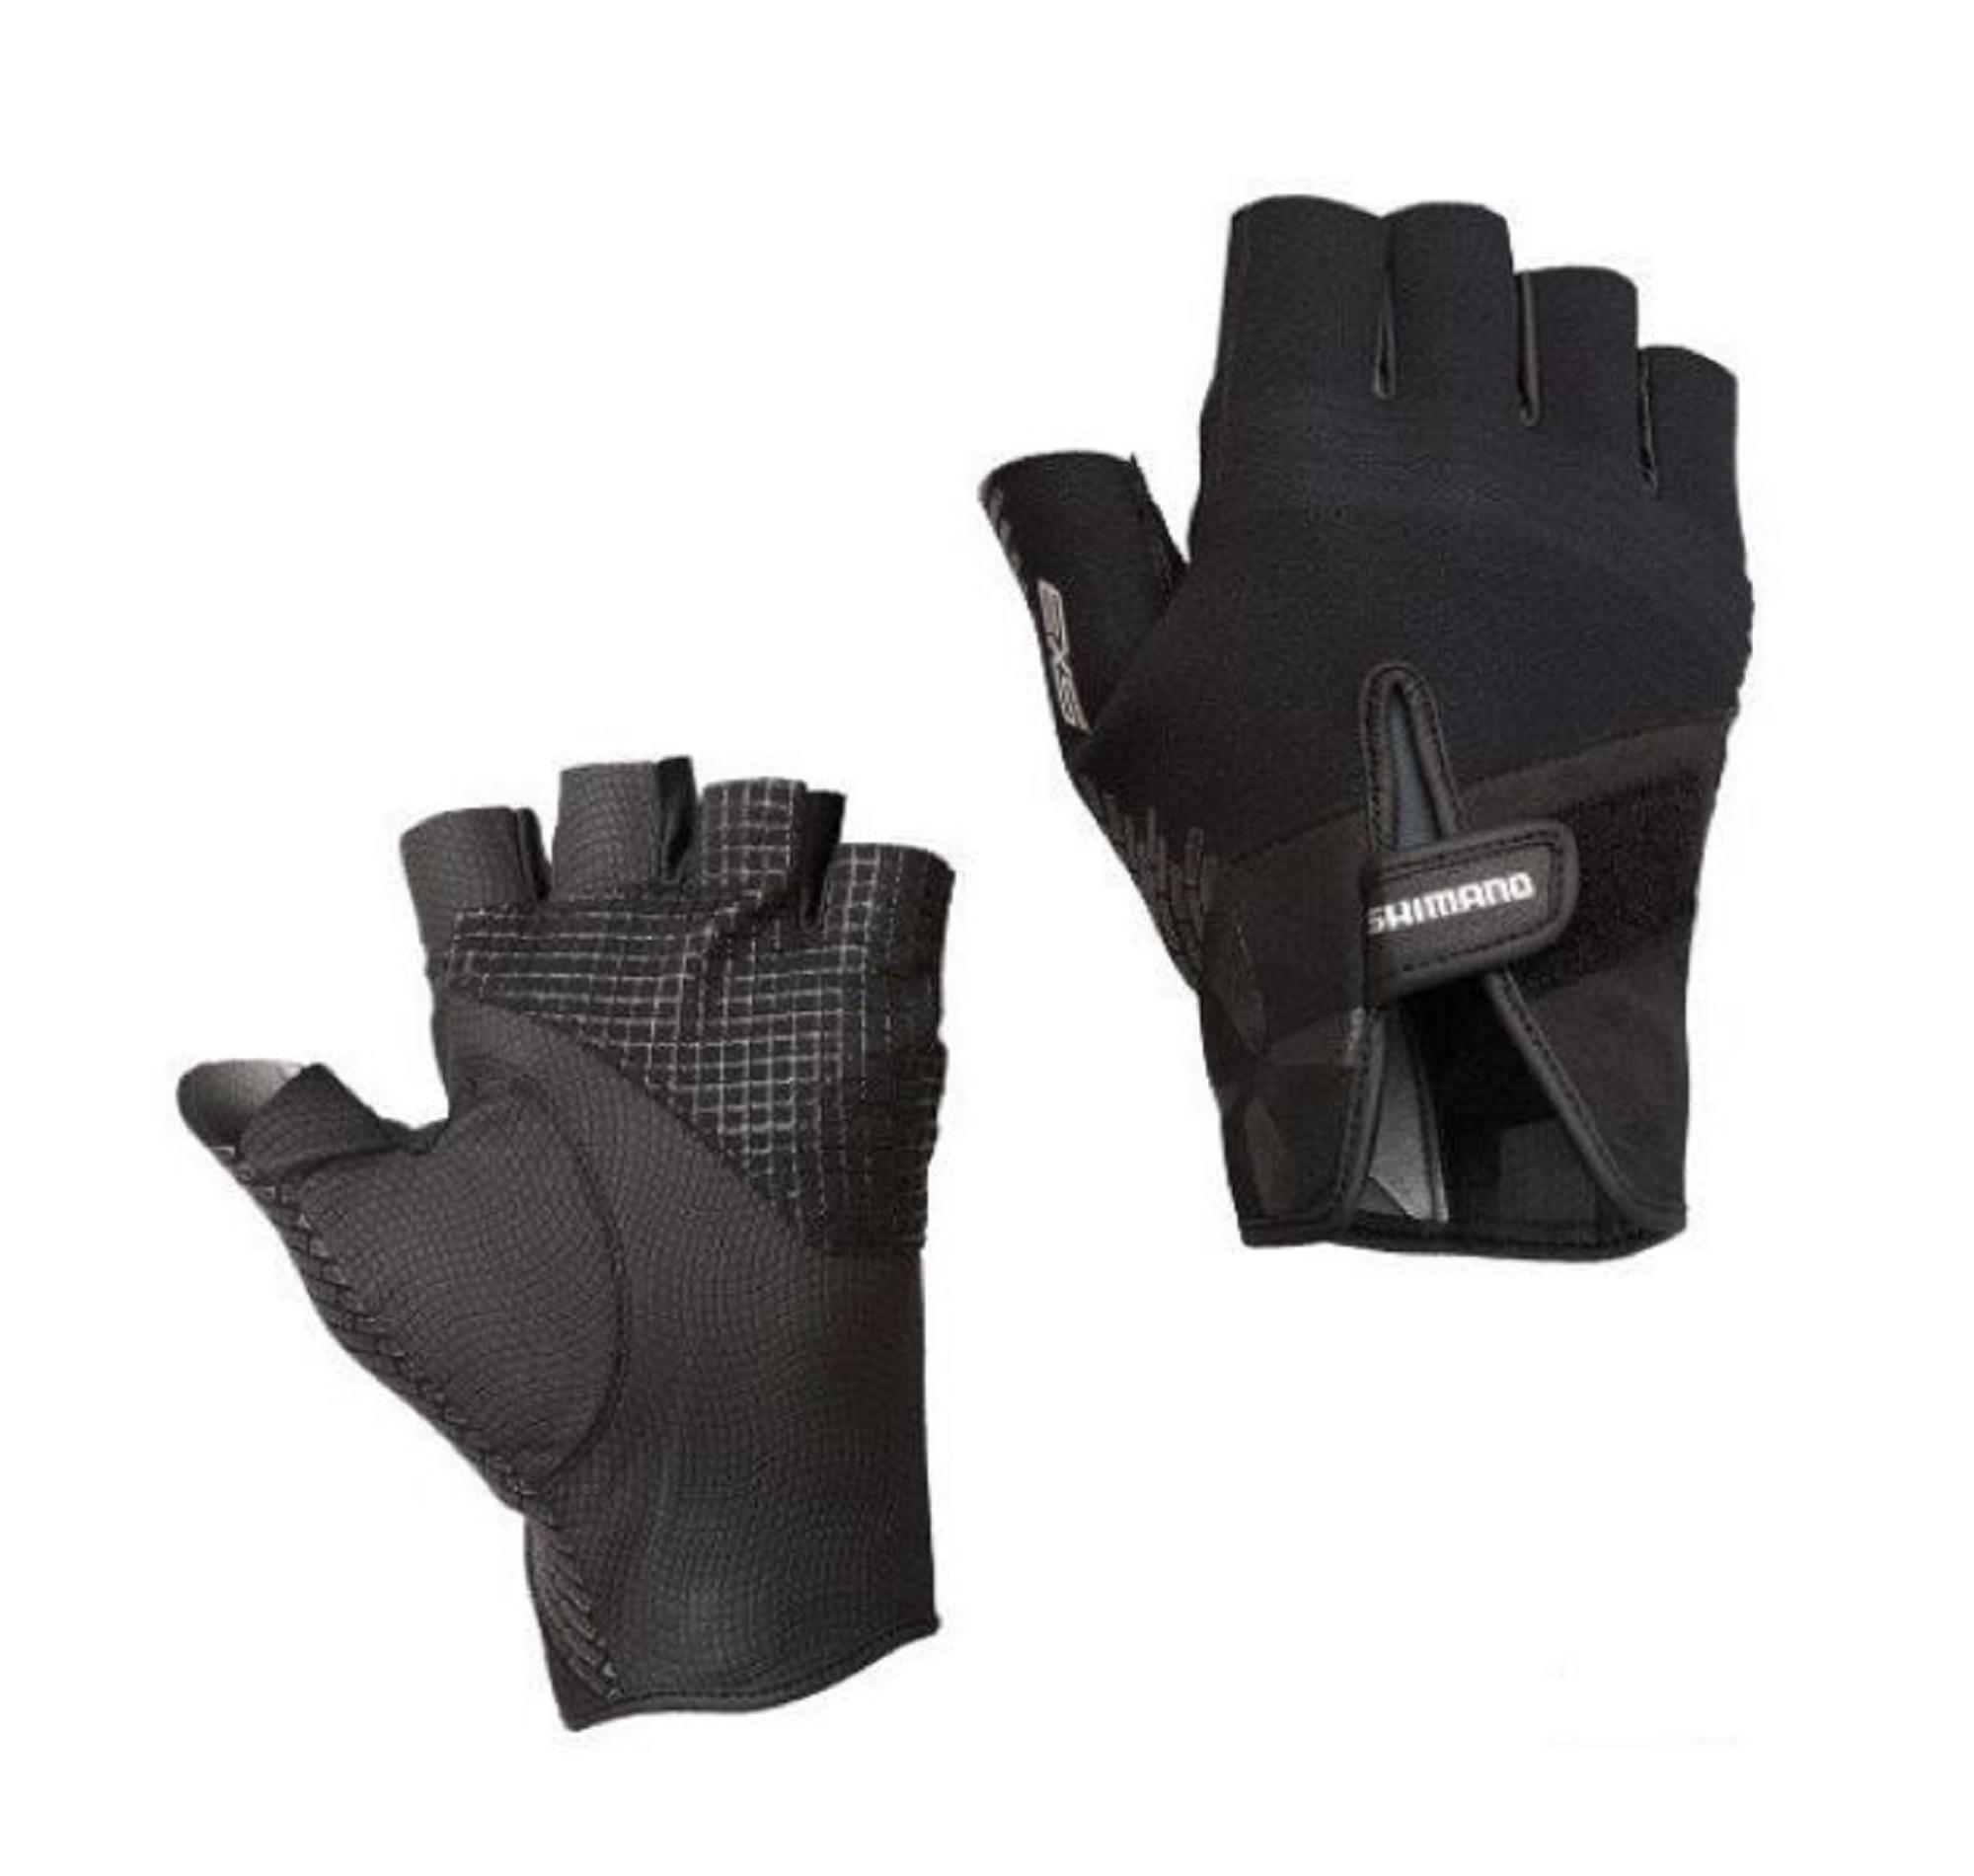 Shimano GL-269P Gloves Fingerless Titanium Size L Black 465870